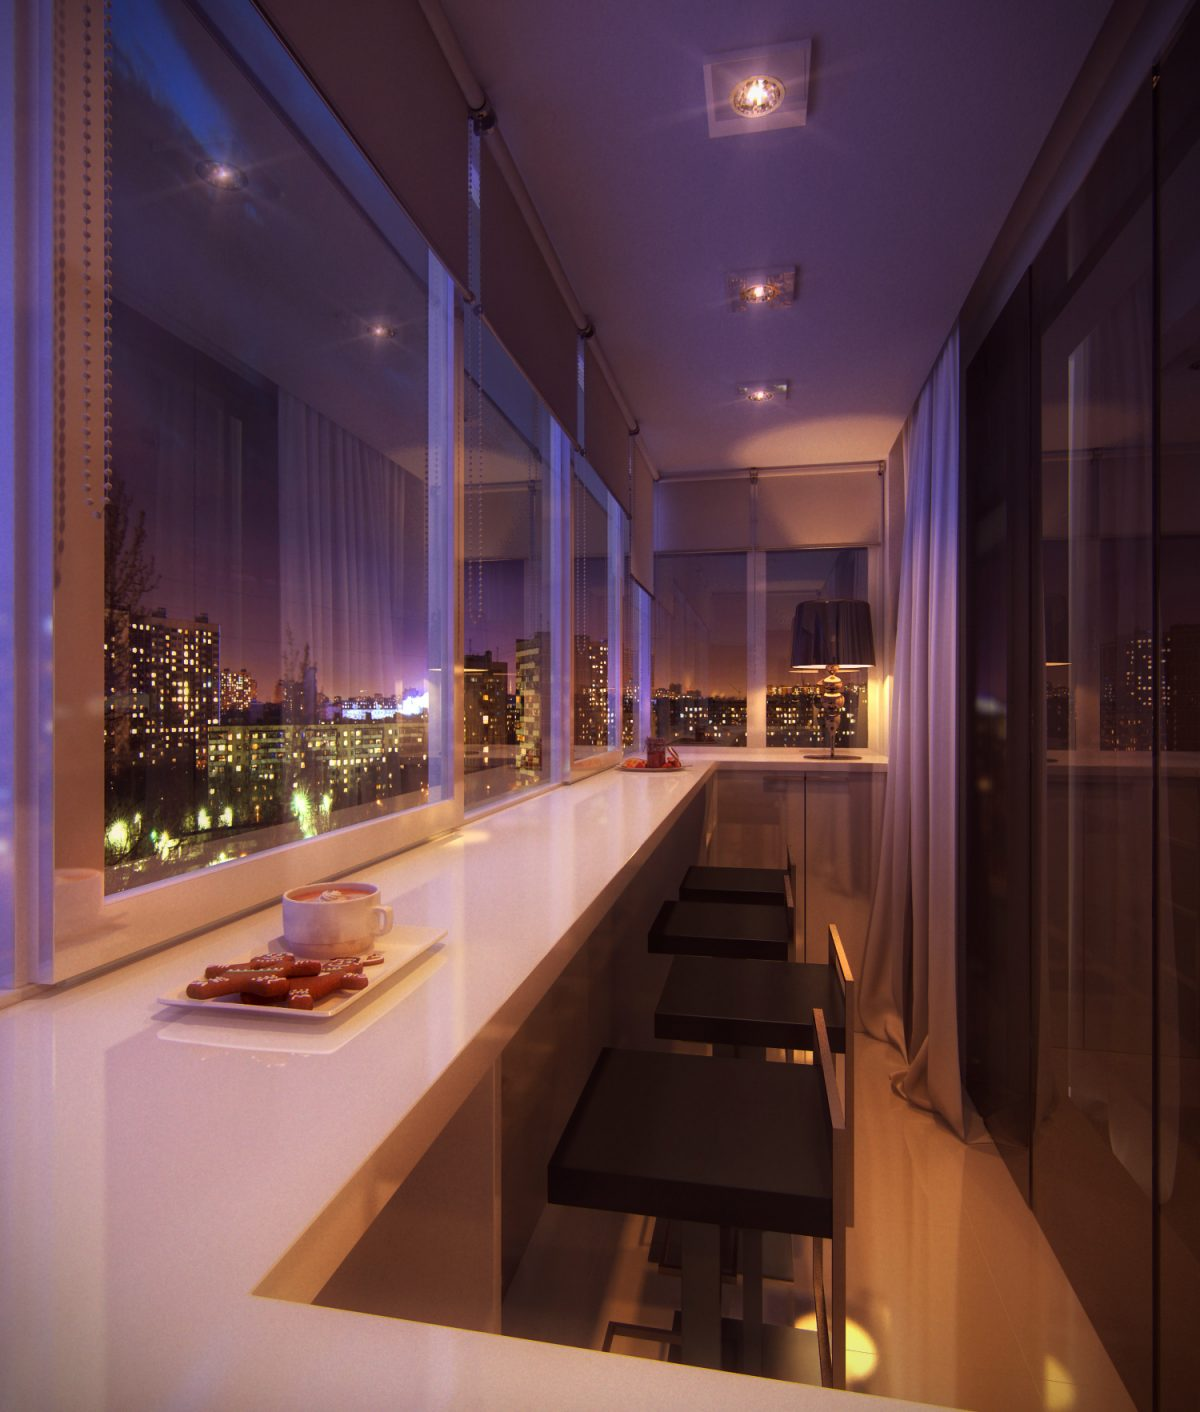 http://prolife.ru.com/wp-content/uploads/2019/02/variant-originalnogo-interera-malenkogo-balkona.jpg